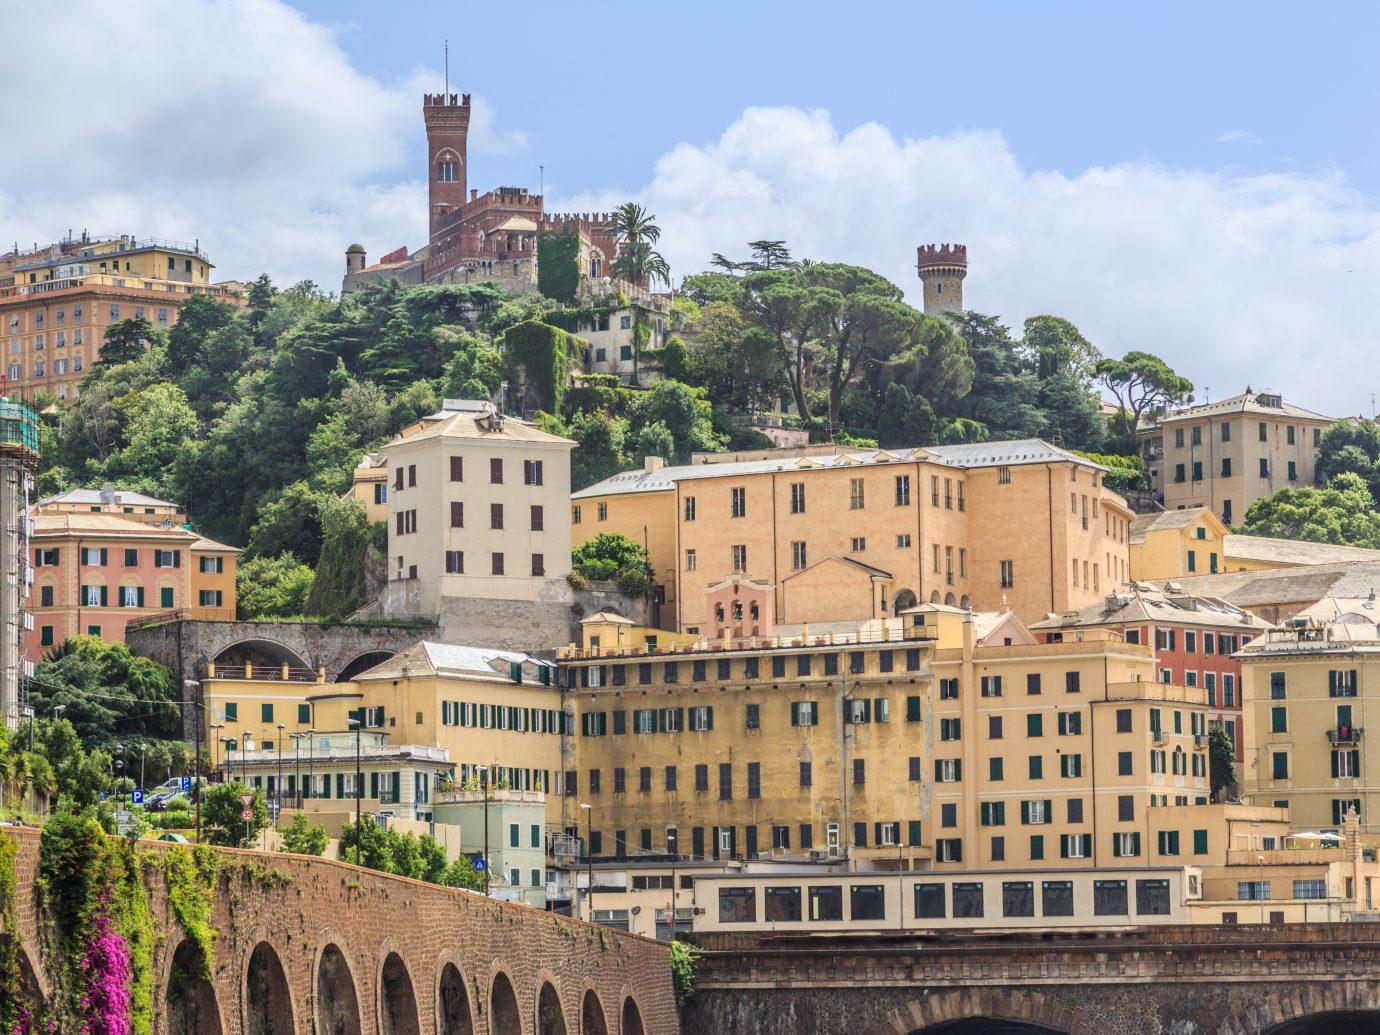 Castello d'Albertis castle in Genoa summer view